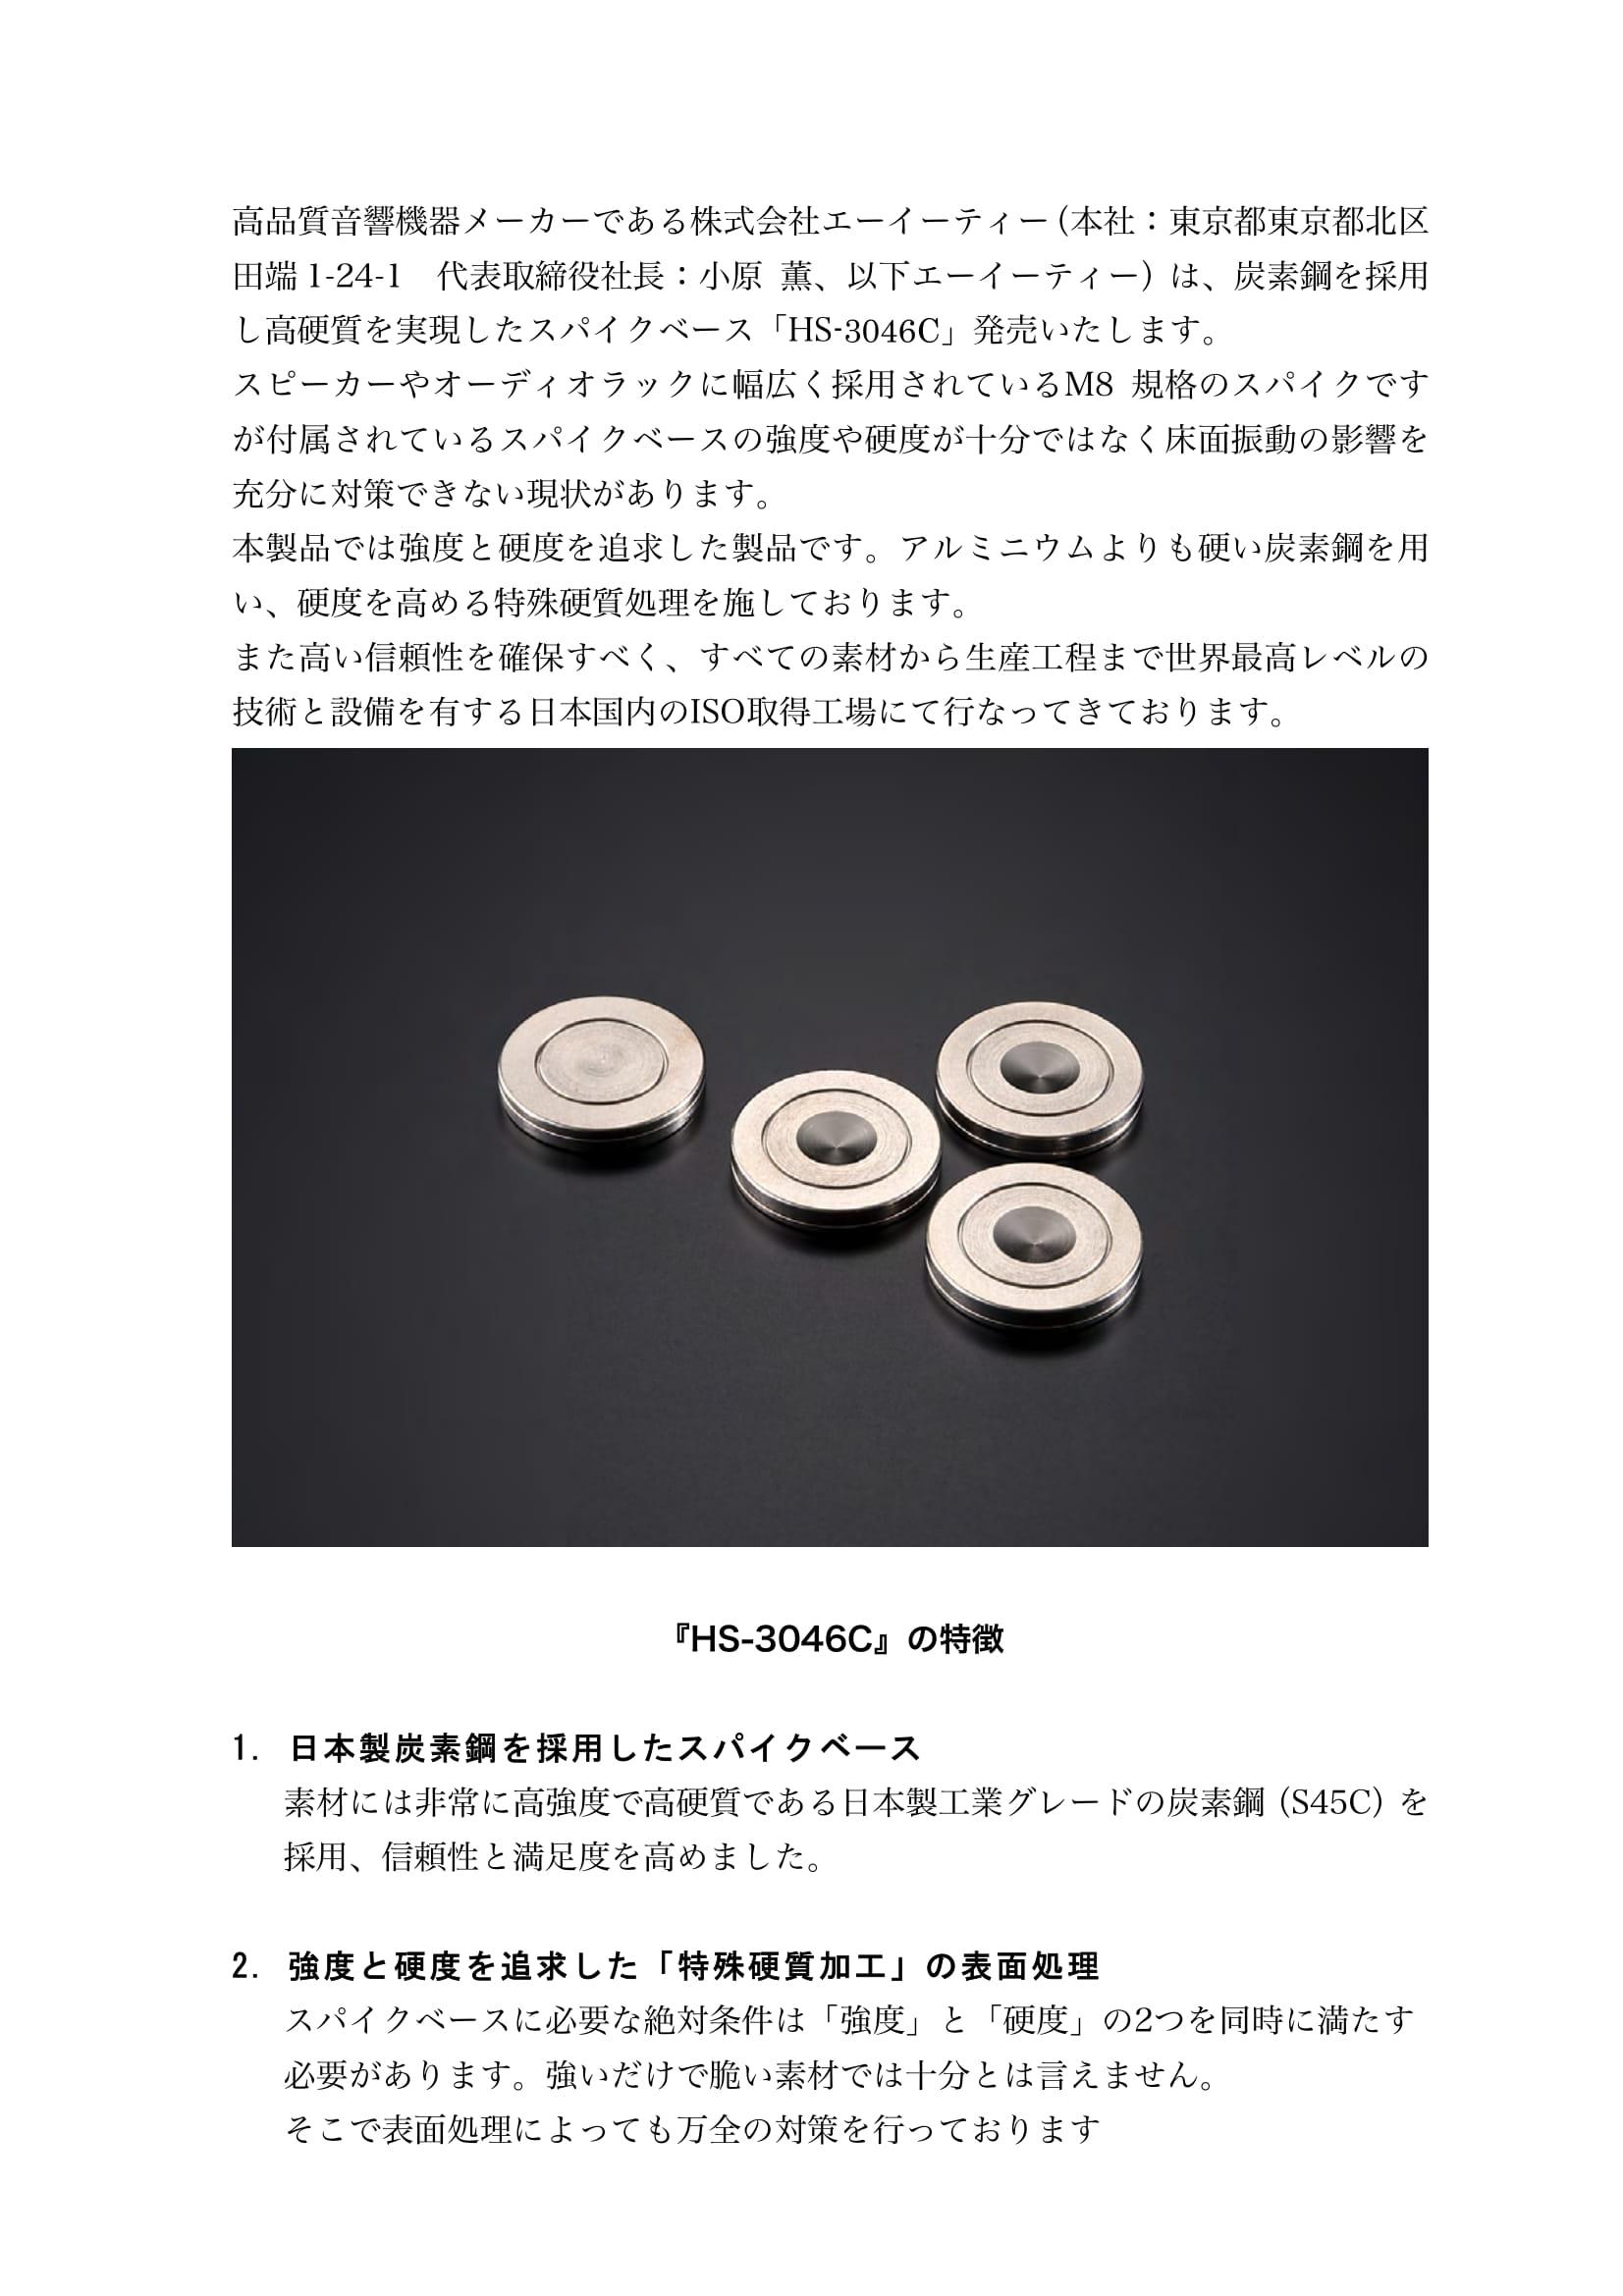 HS-3046Cリリース-2